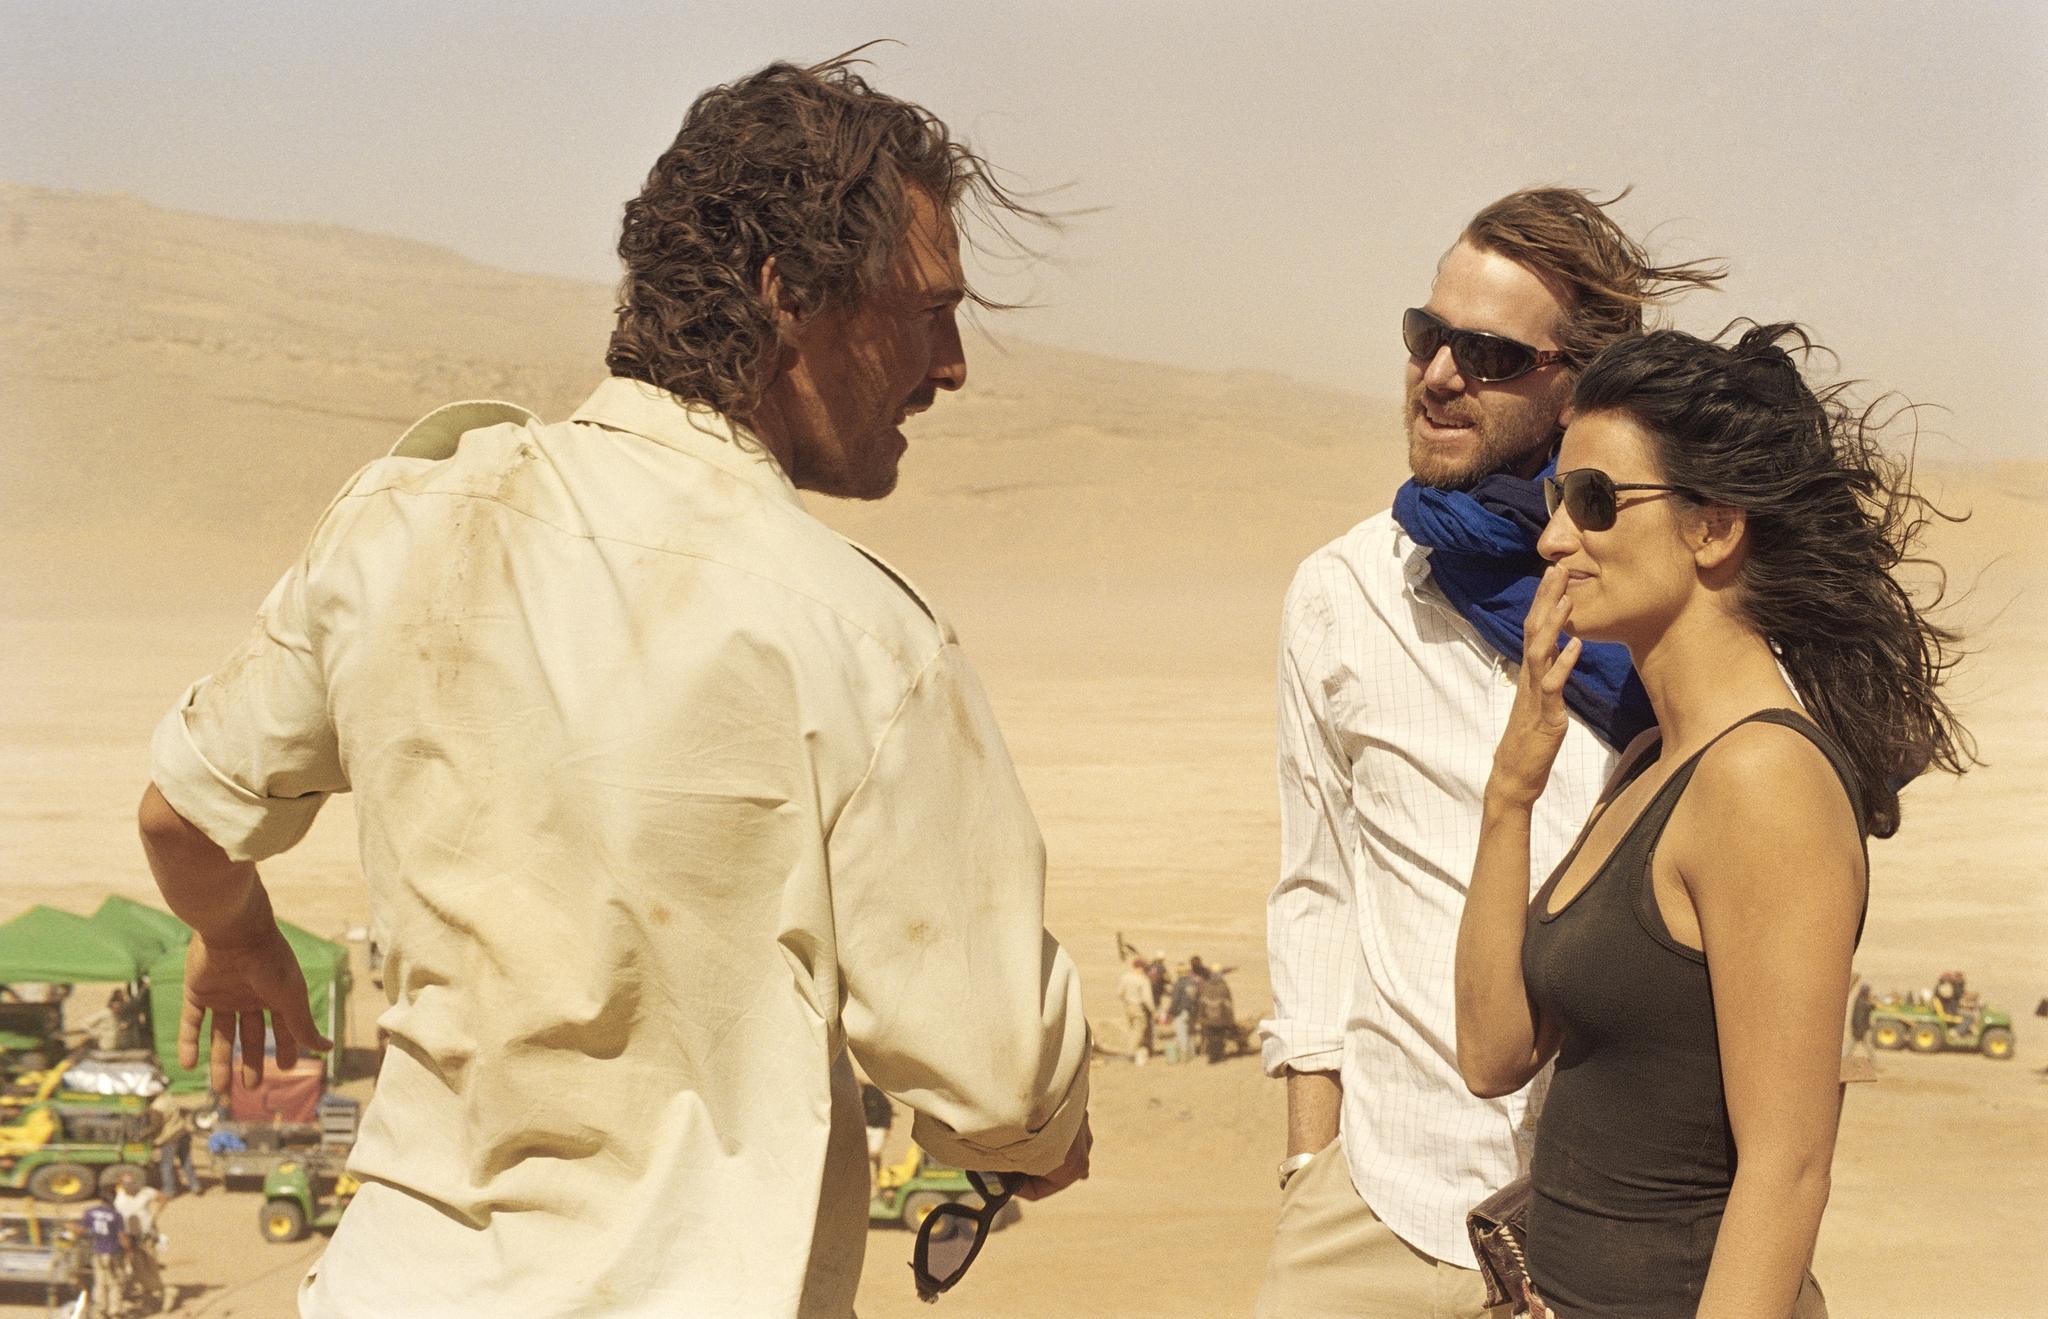 Matthew McConaughey and Penélope Cruz in Sahara (2005)